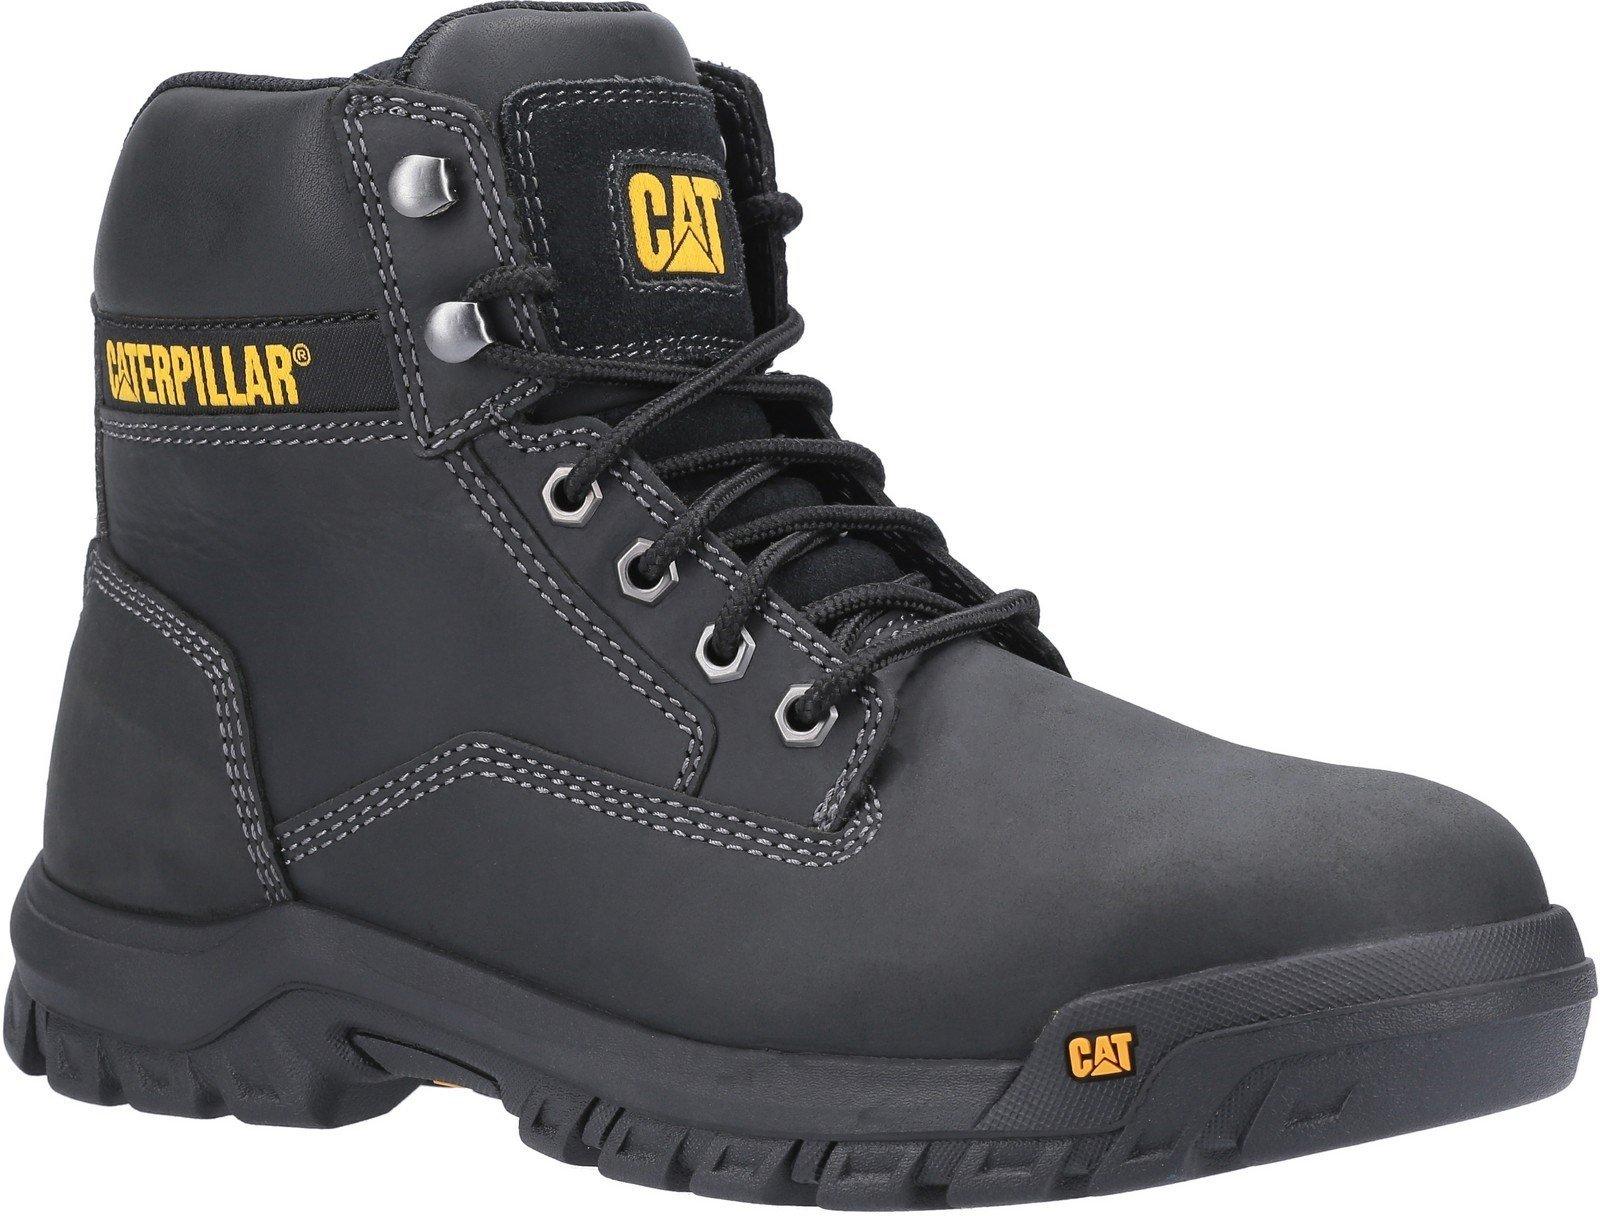 Caterpillar Men's Median S3 Lace Up Safety Boot Black 30431 - Black 6